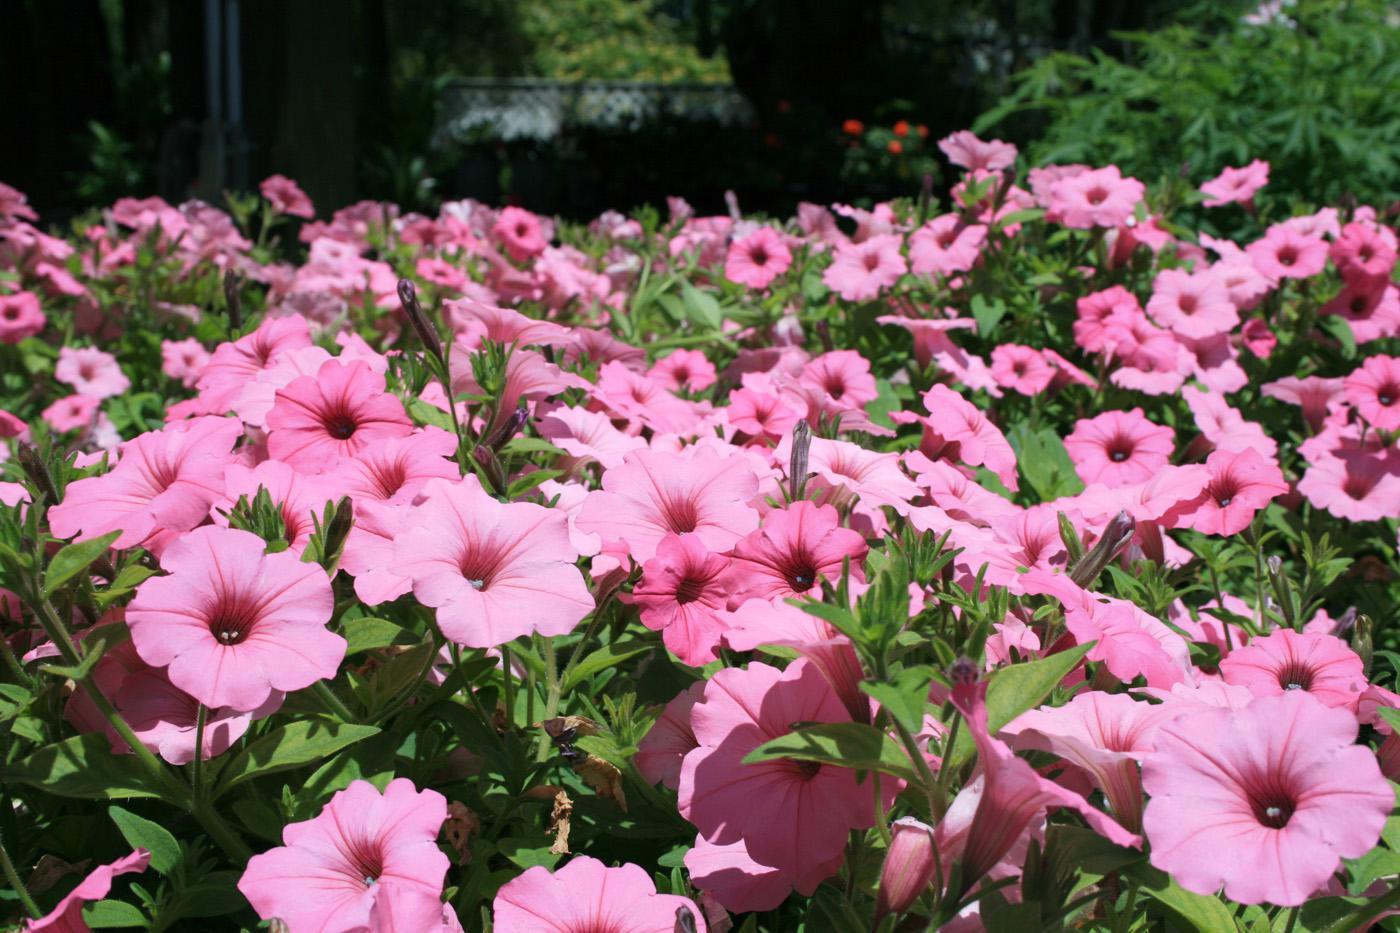 Using organic soil amendments can produce beautiful flowering displays, such as these Vista Bubblegum Petunia Supertunias. (Photo by Gary Bachman)